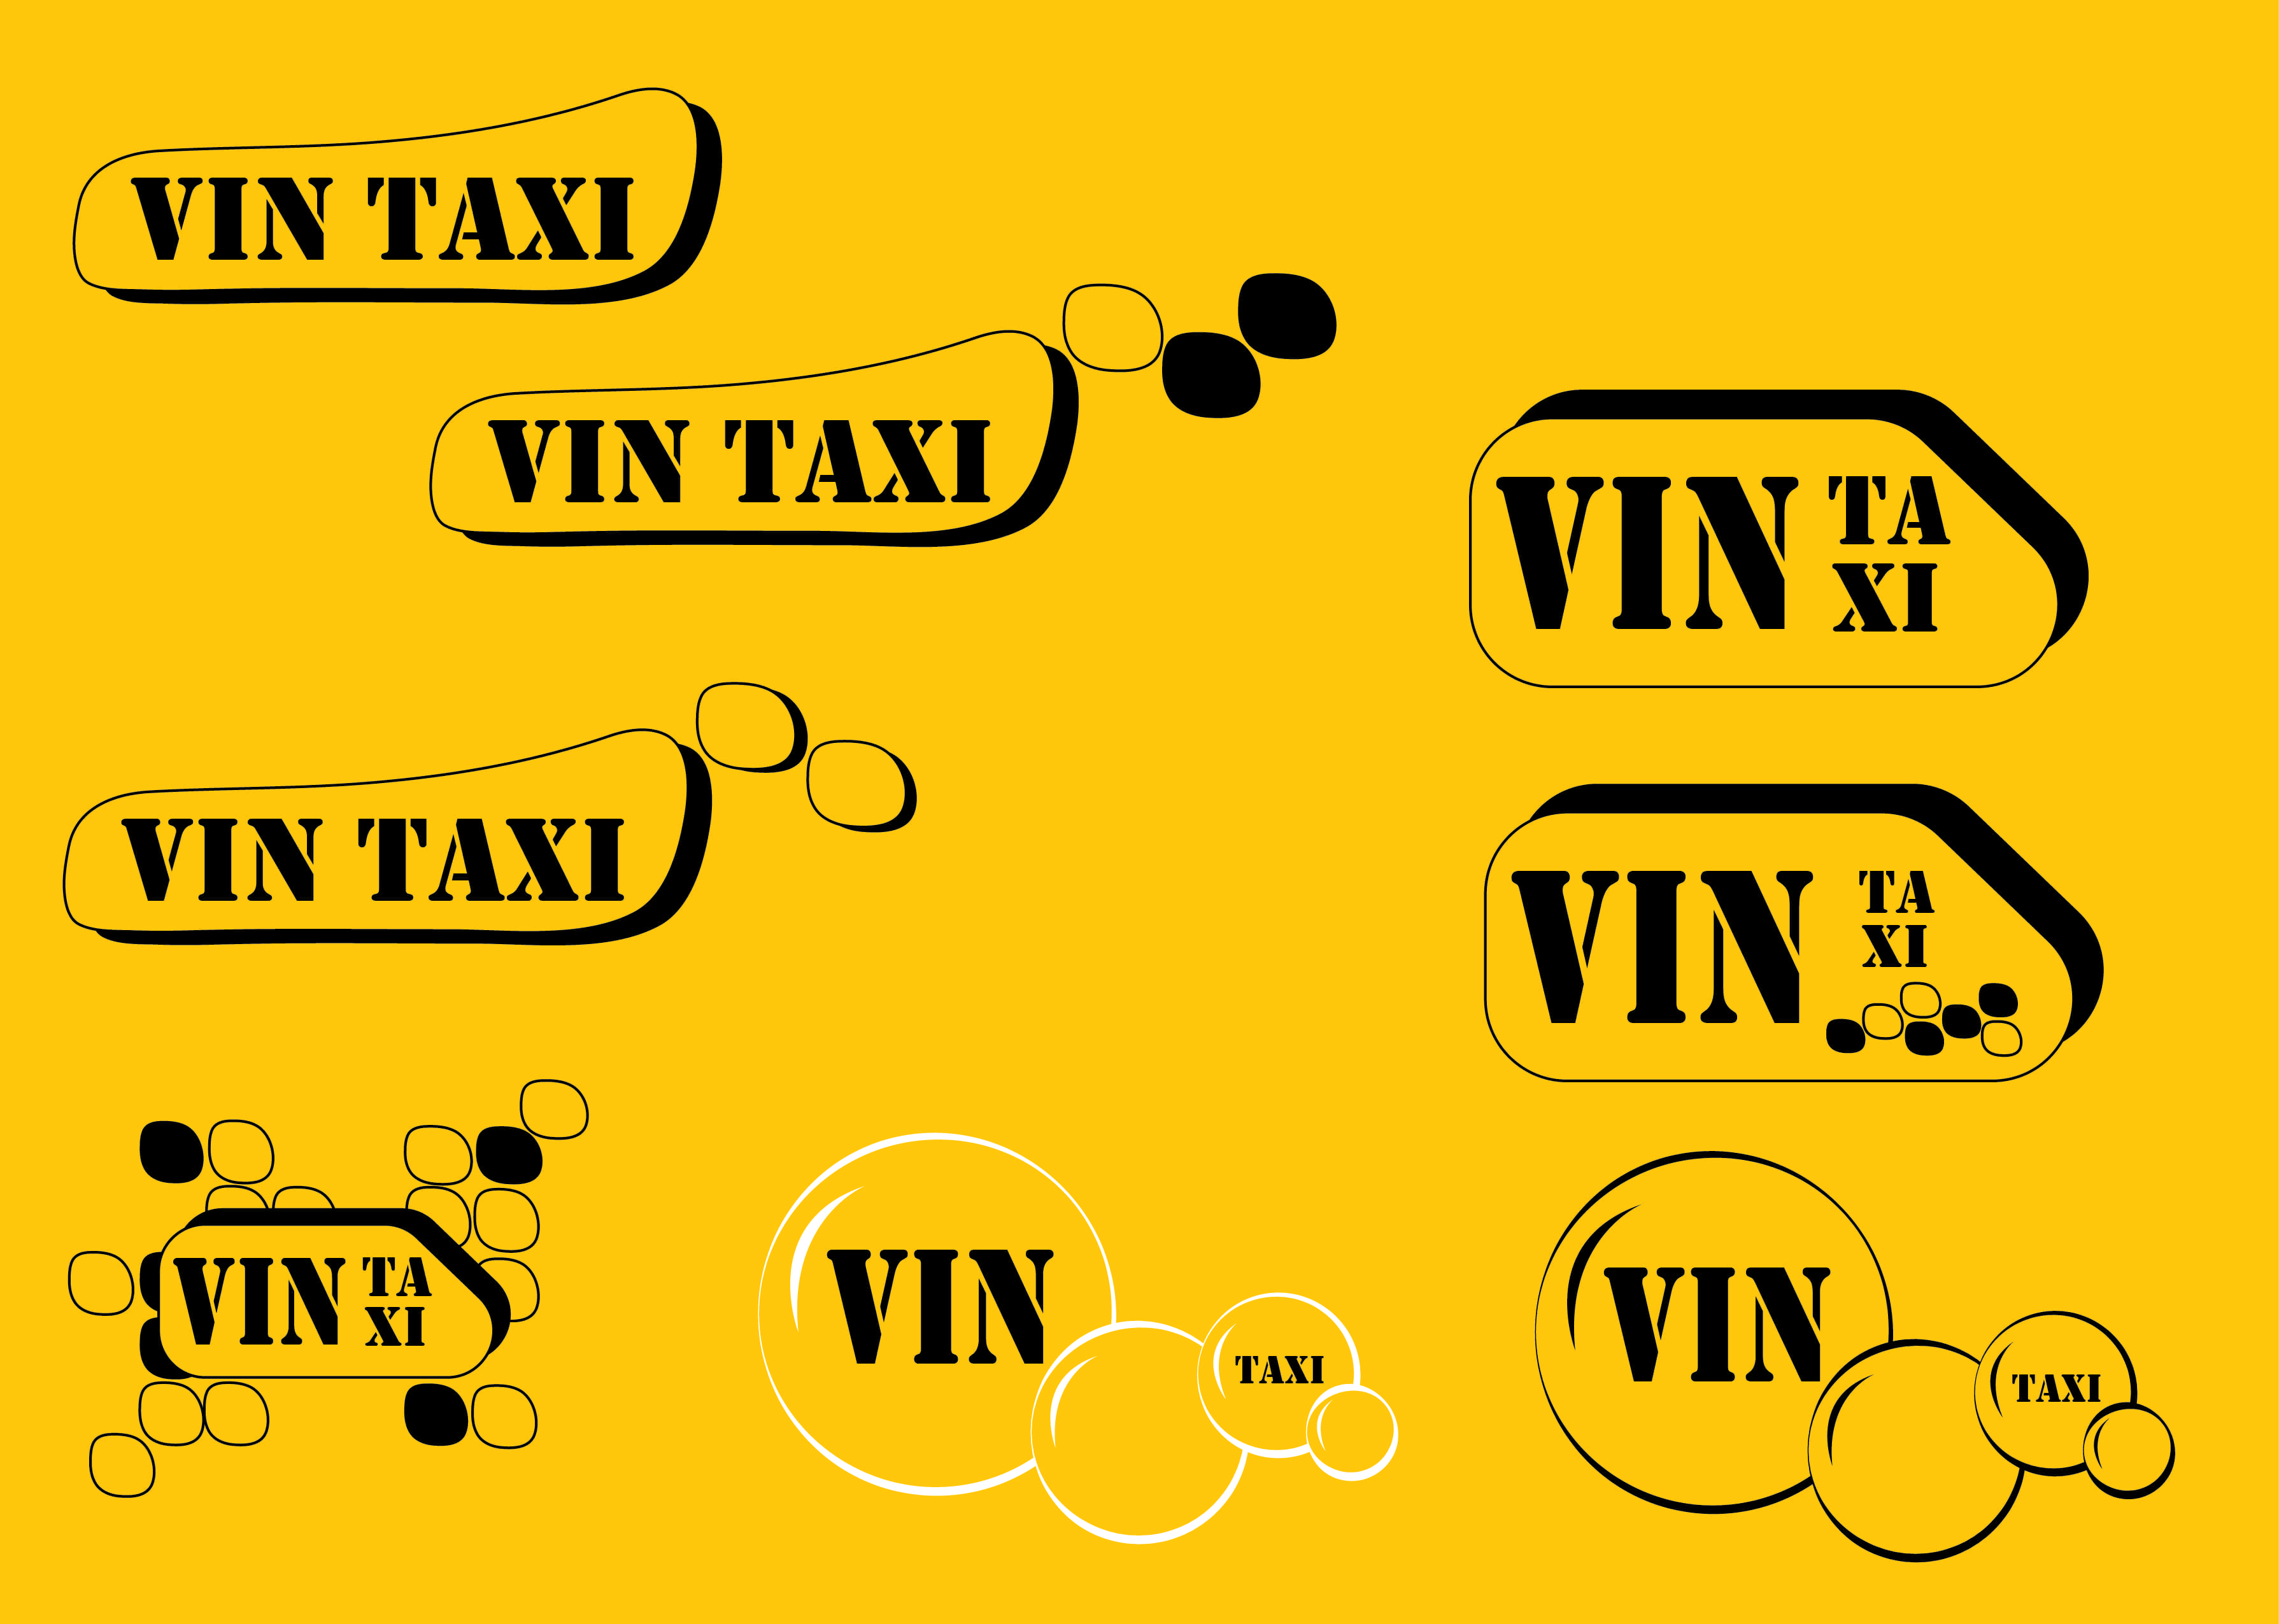 Разработка логотипа и фирменного стиля для такси фото f_5805b9eb905d0610.jpg